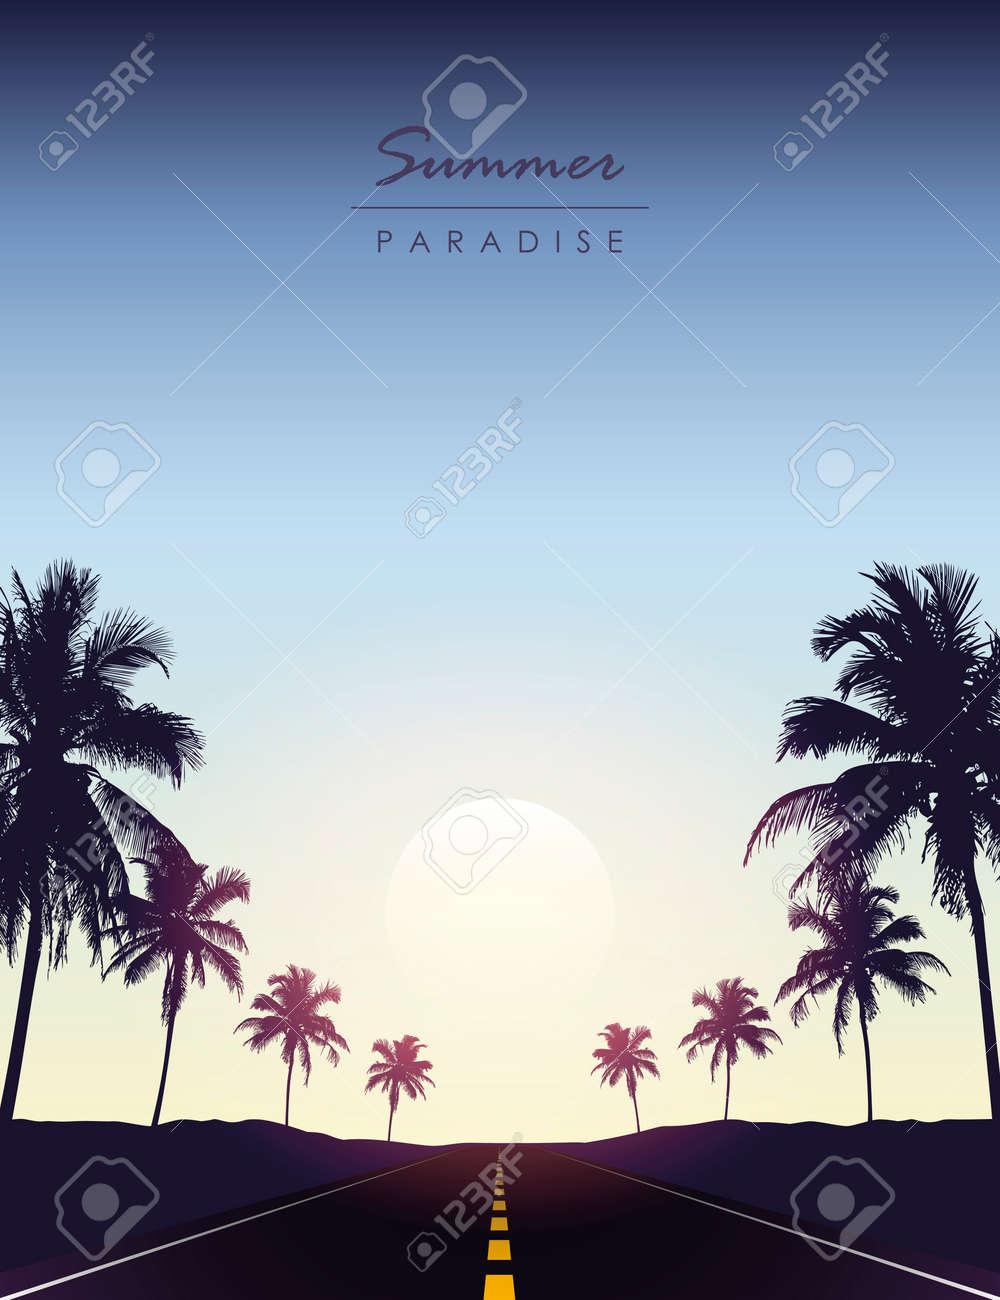 summer paradise road trip beautiful sunset tropical palm - 169841385